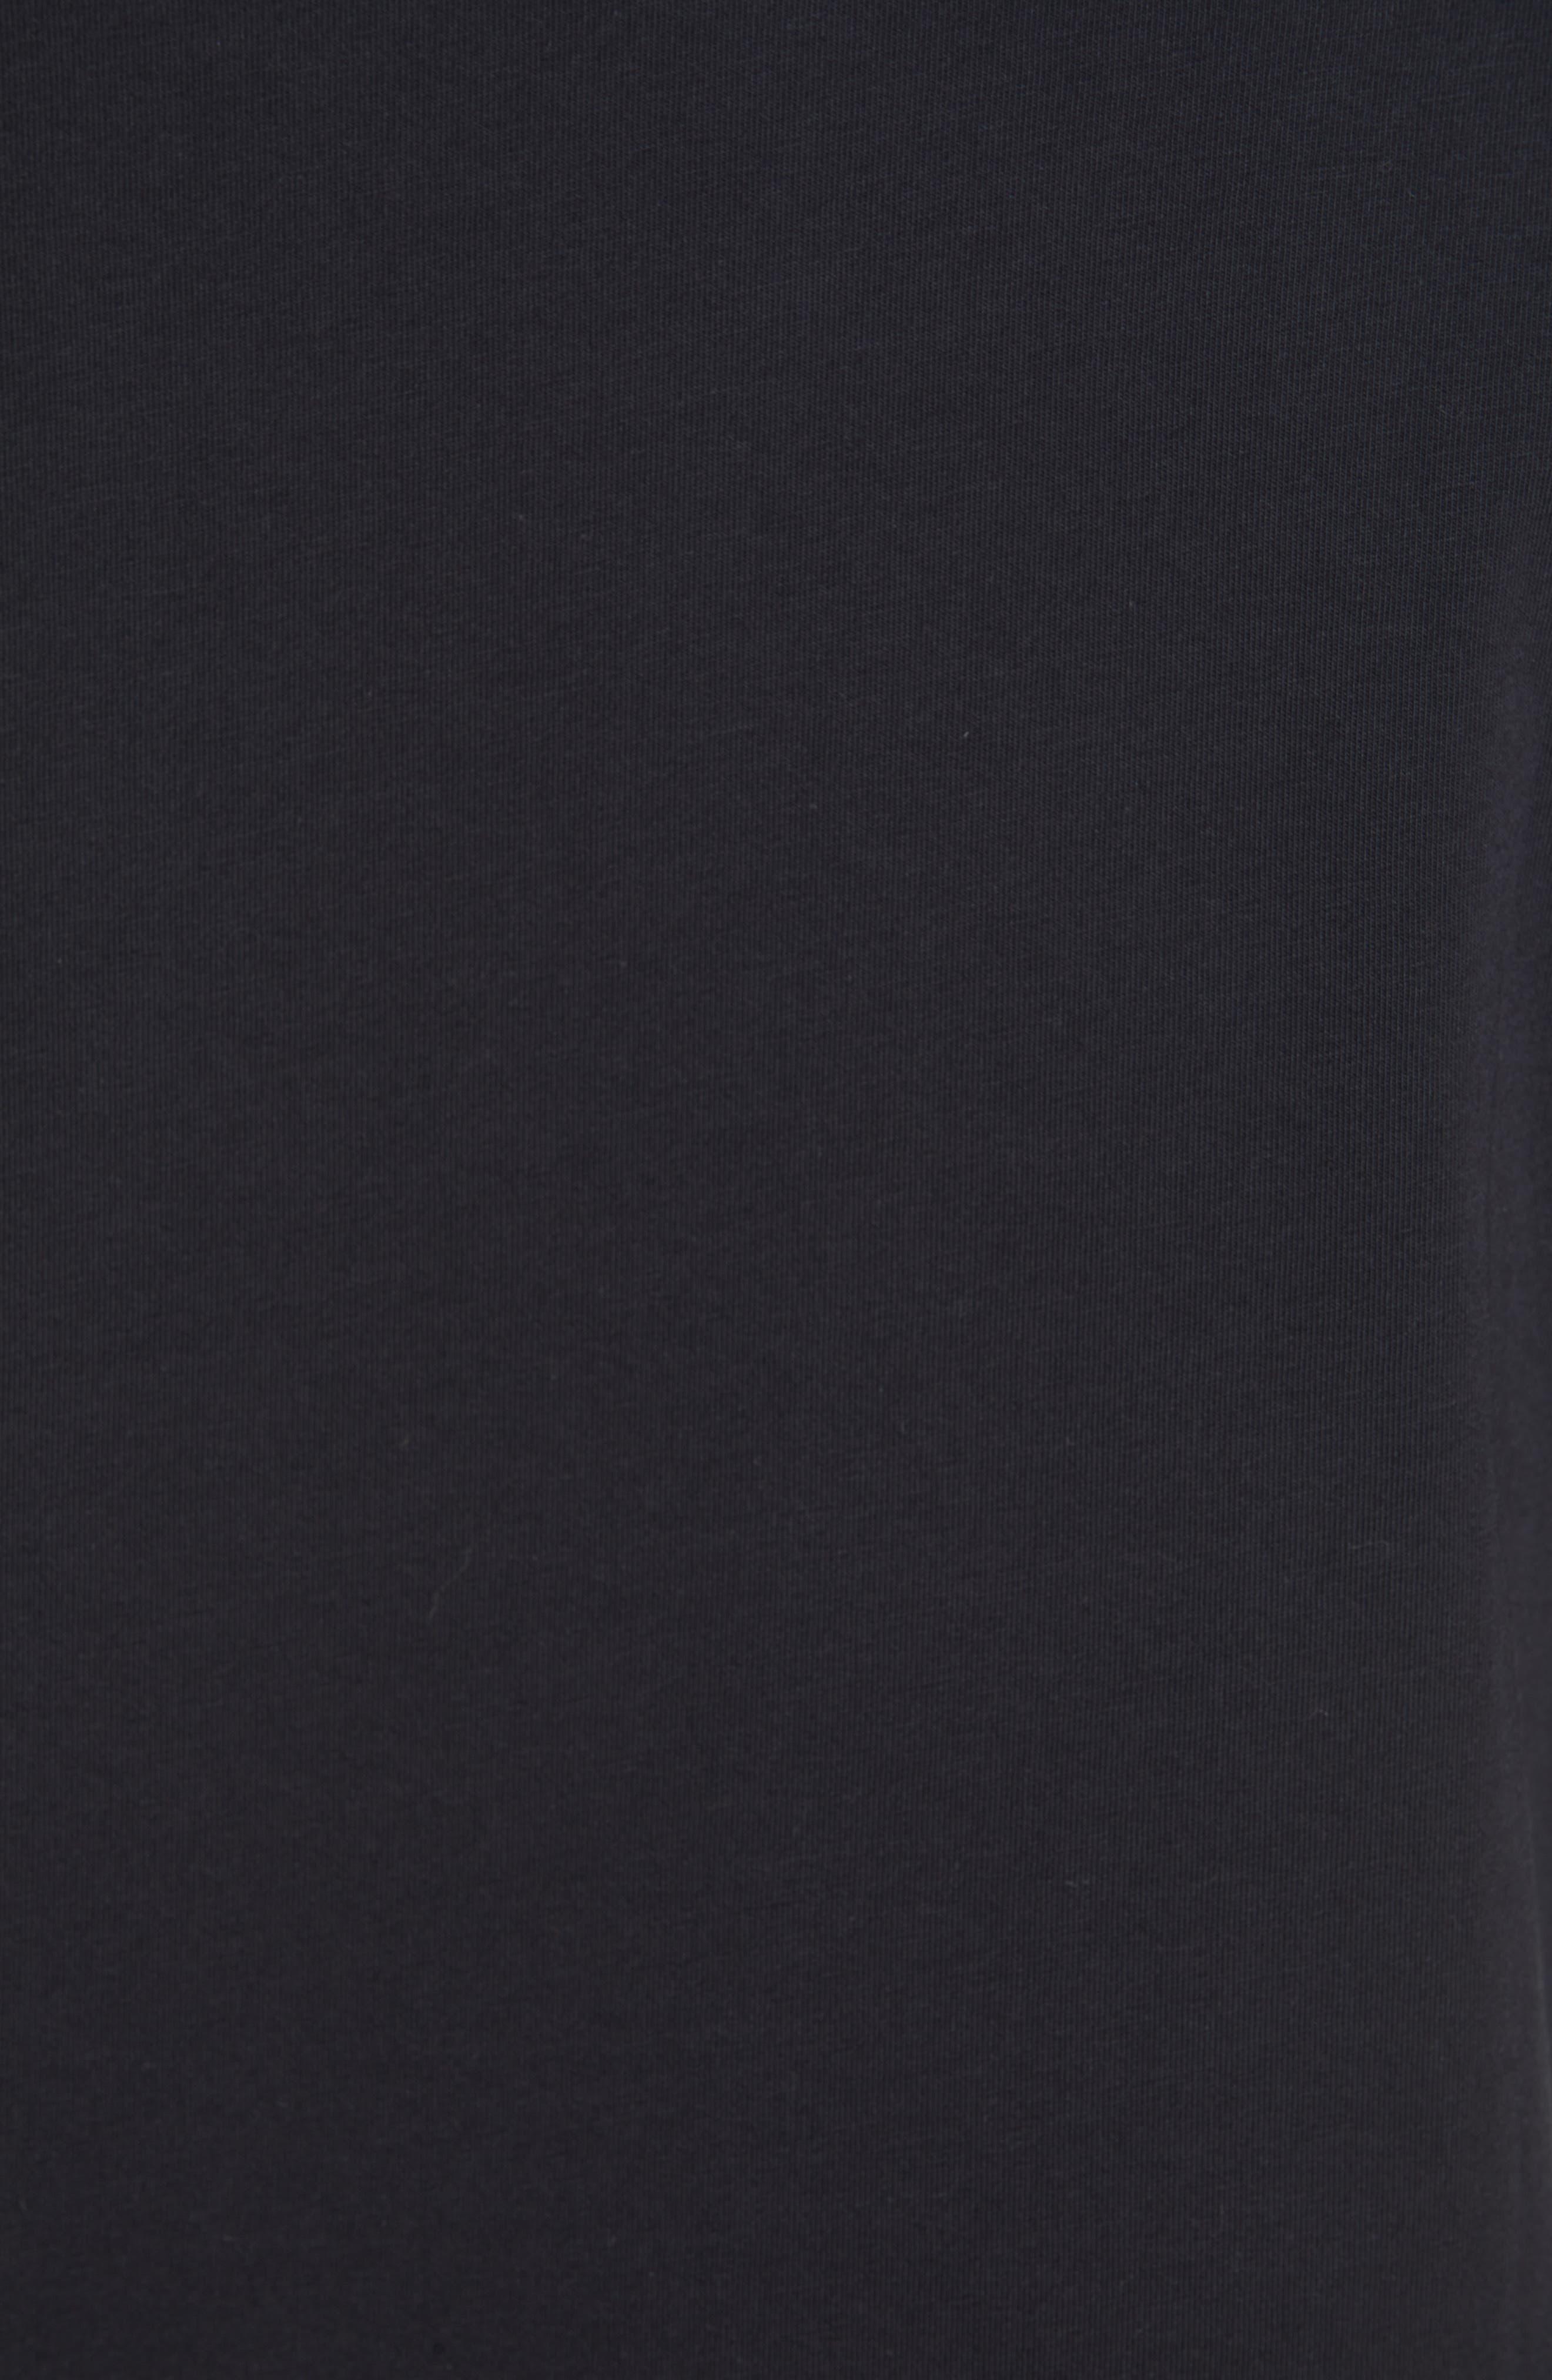 VERSACE COLLECTION,                             Medusa Long Sleeve T-Shirt,                             Alternate thumbnail 5, color,                             BLACK